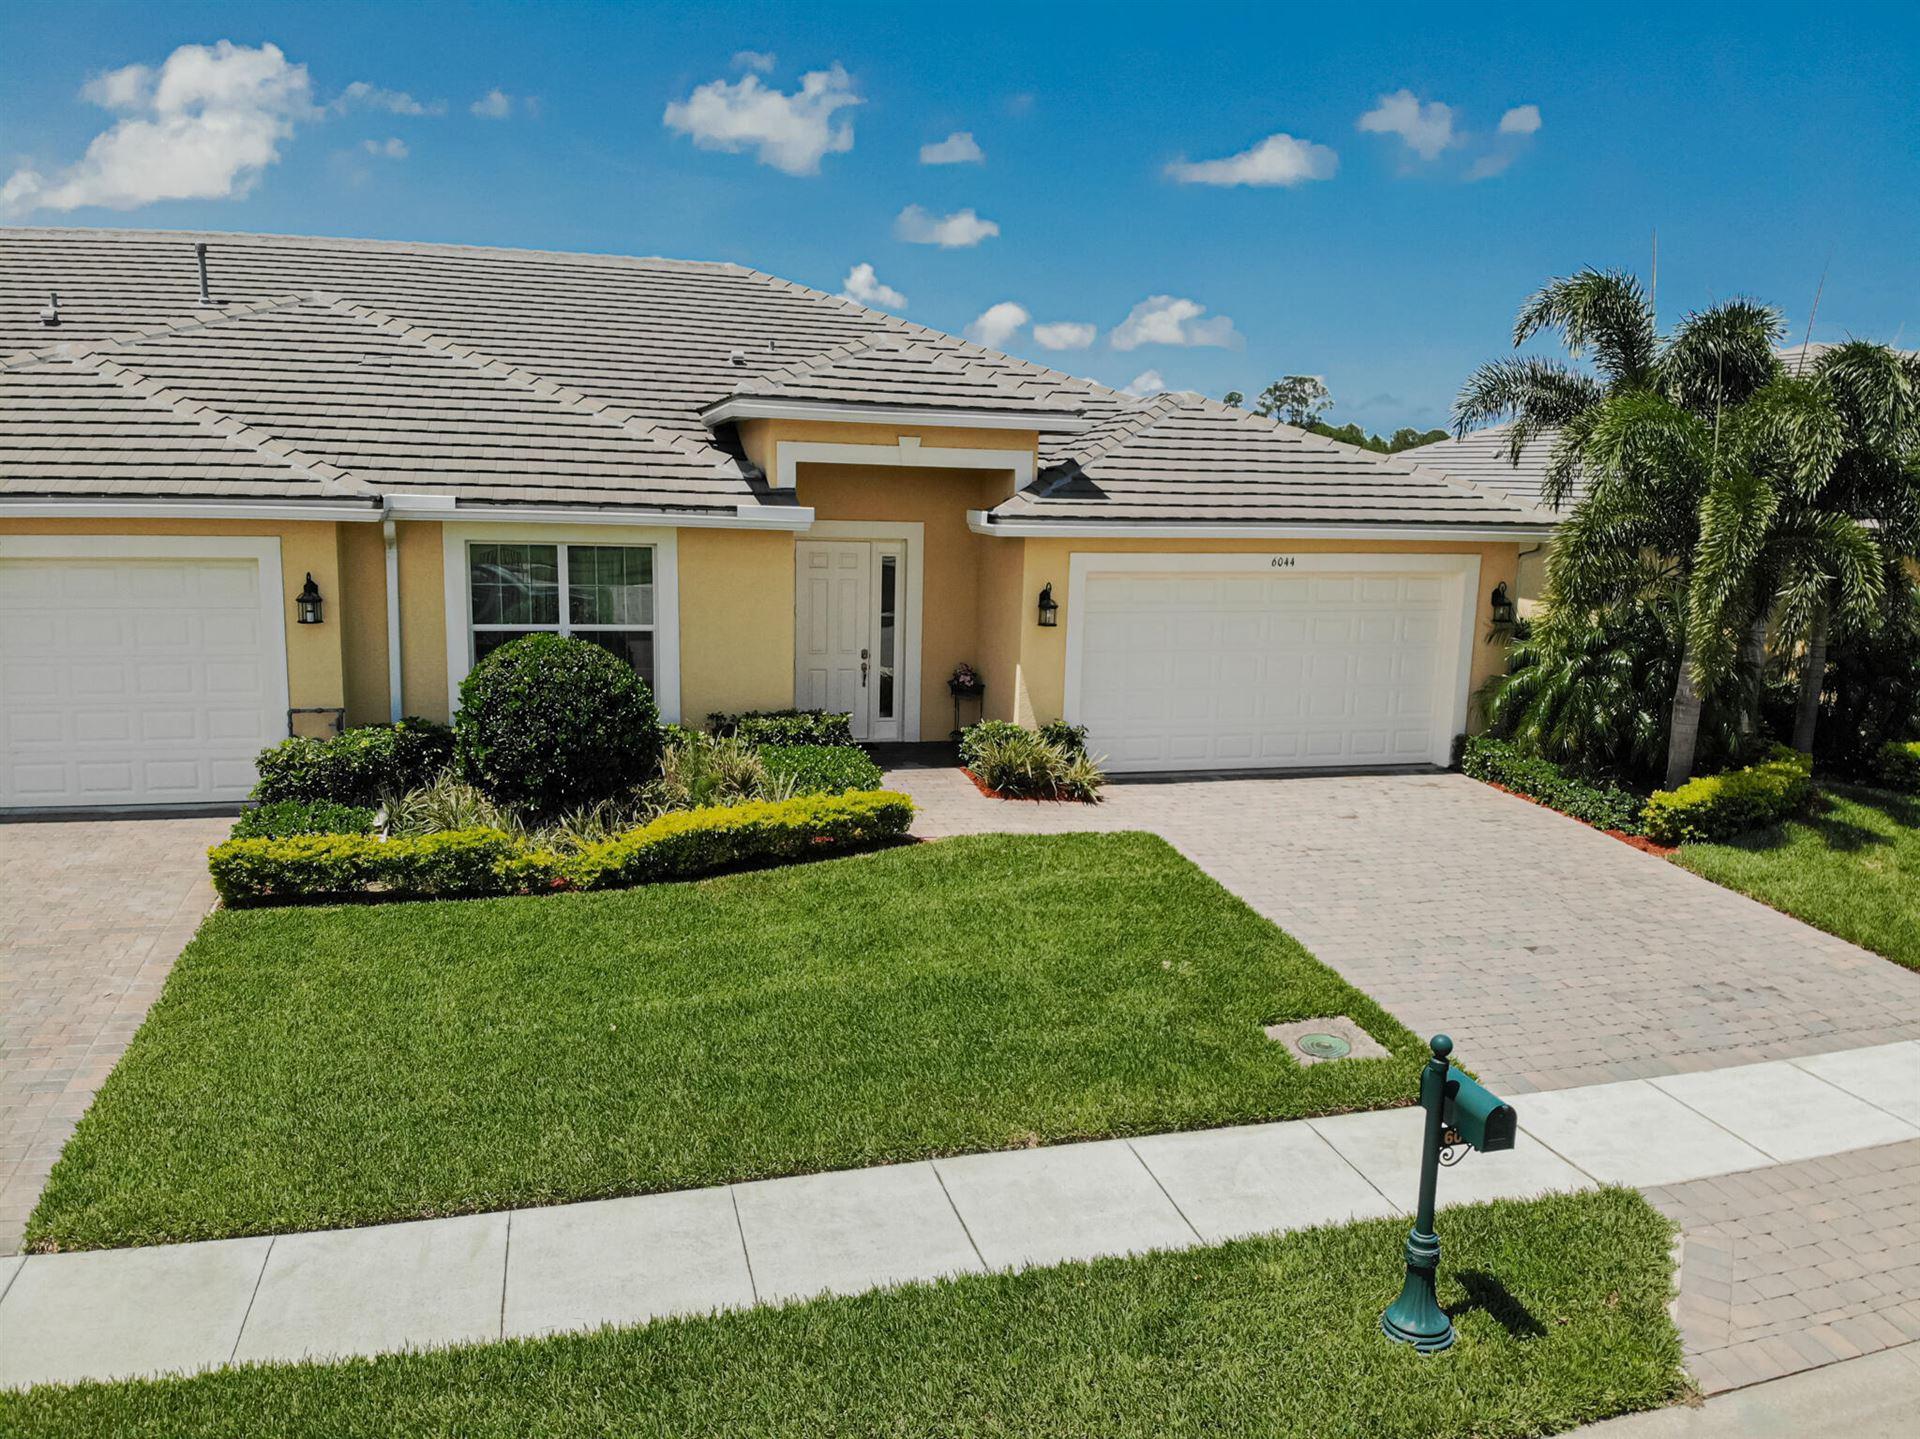 6044 NW Cullen Way, Port Saint Lucie, FL 34983 - MLS#: RX-10737715